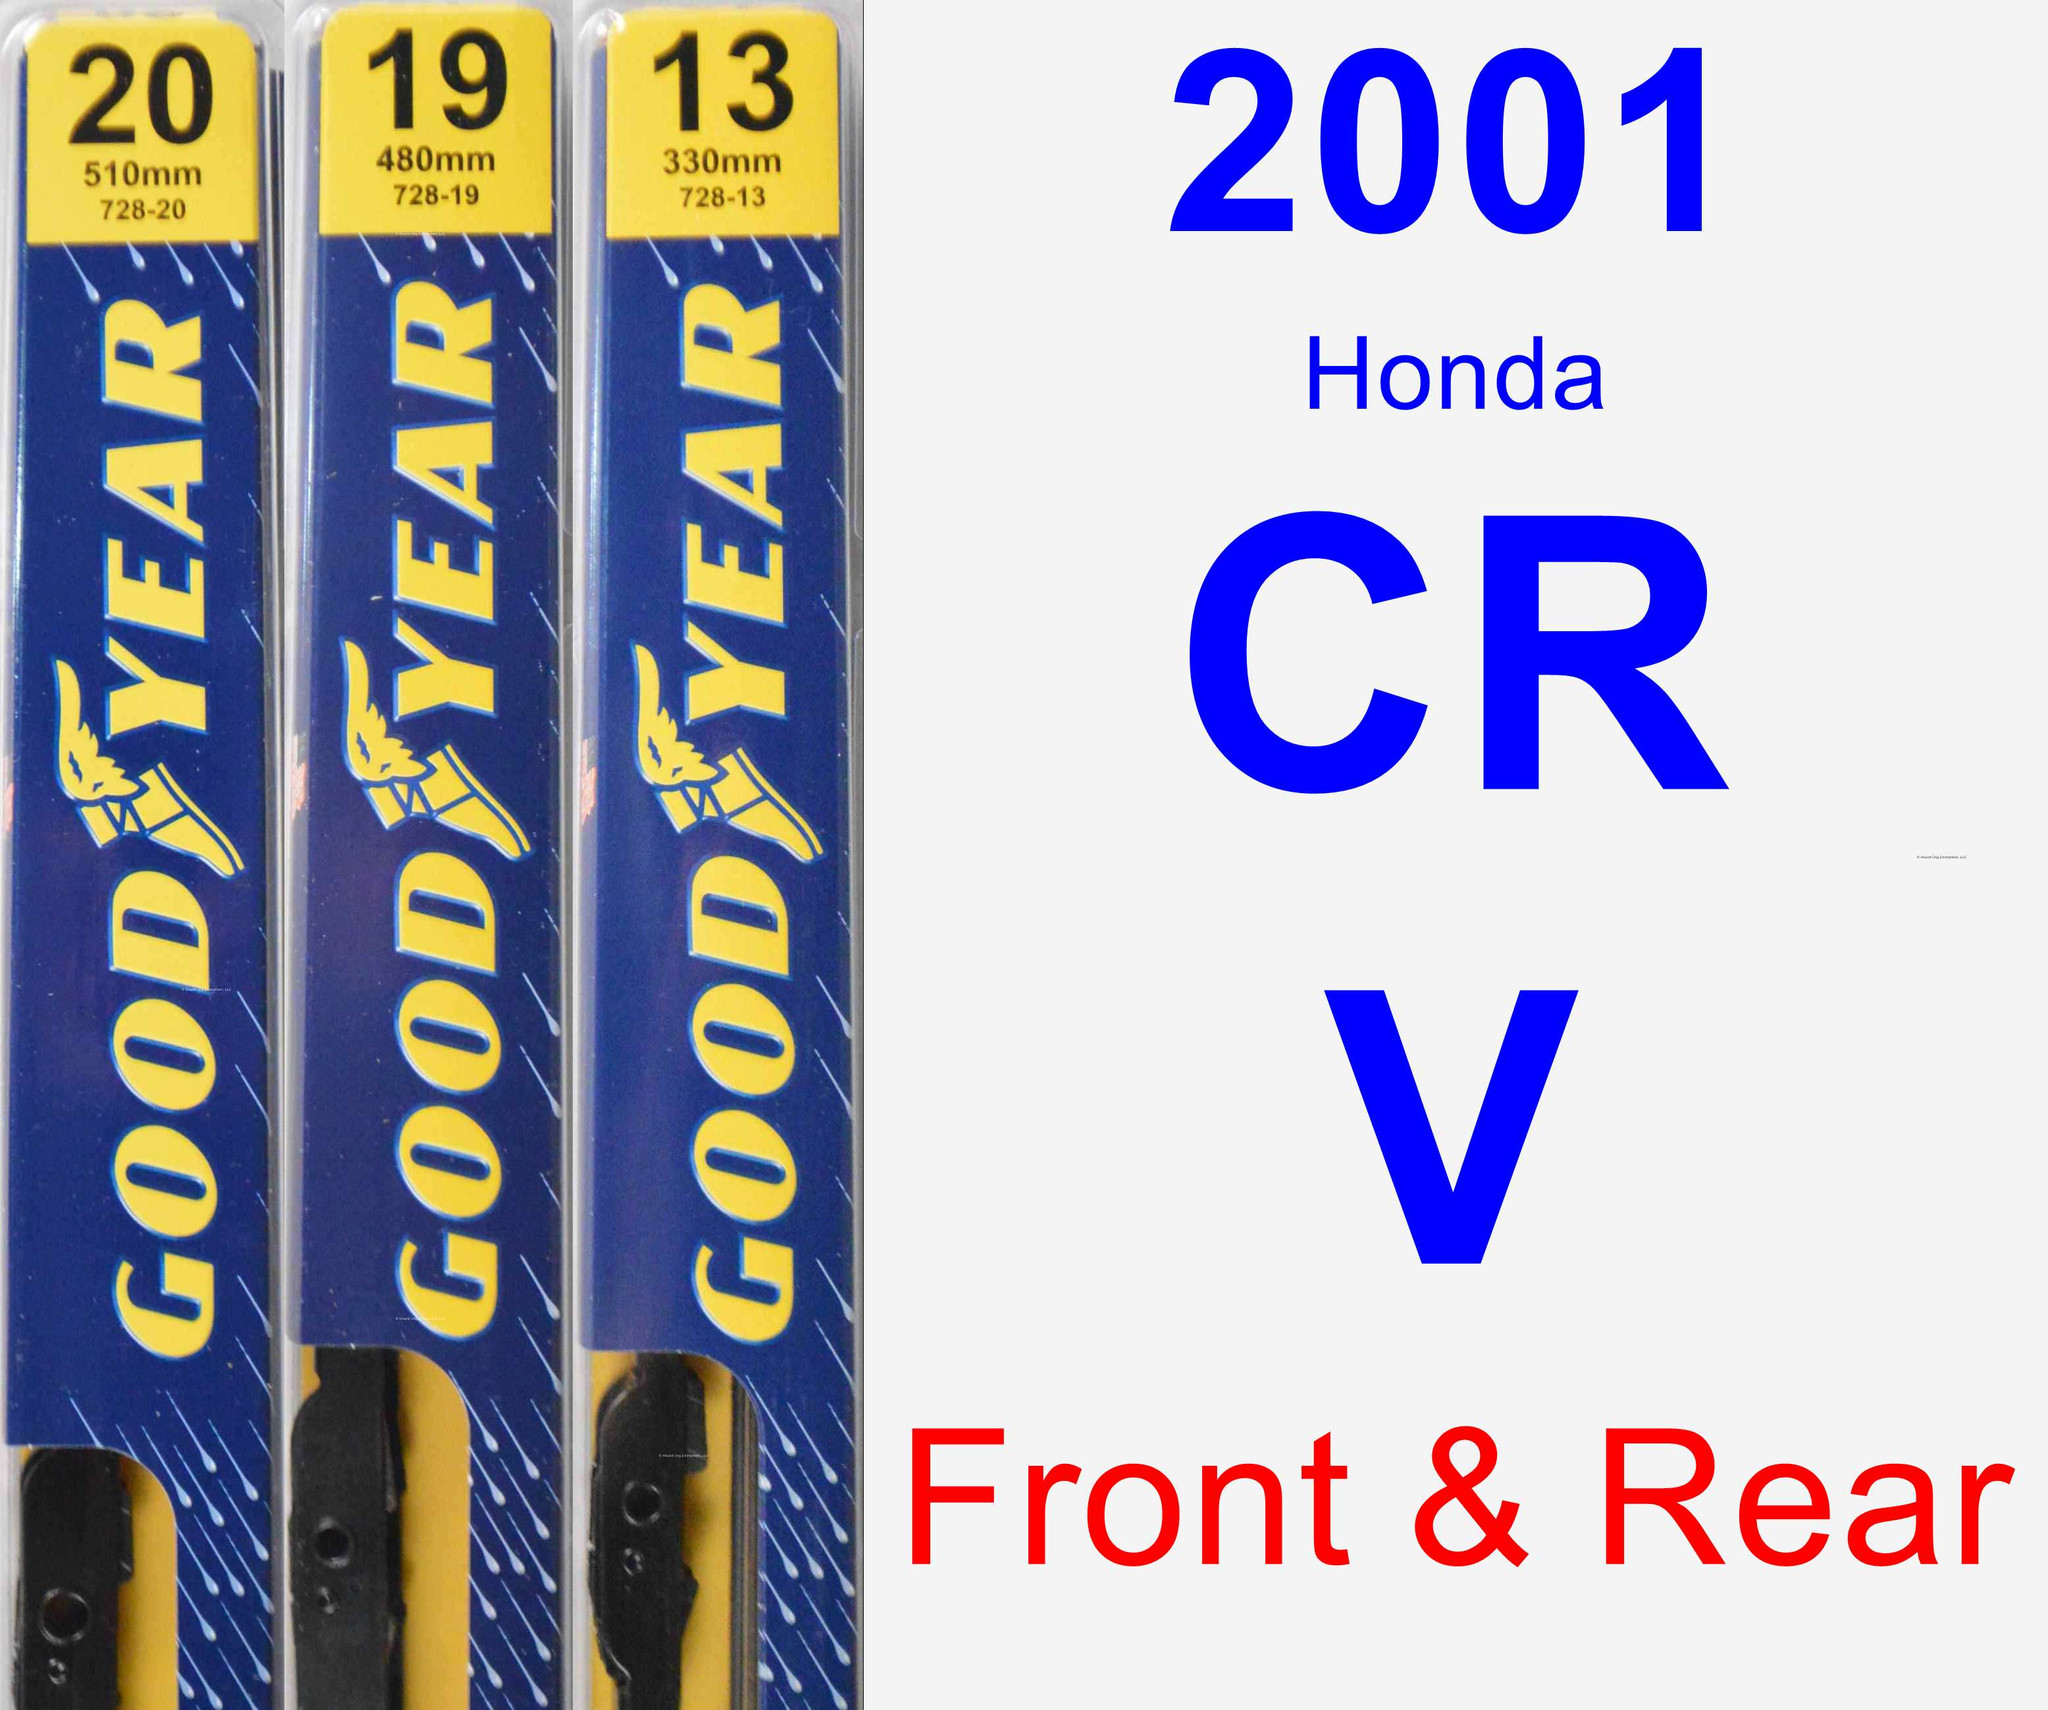 1997-2001 Lexus ES300 Goodyear Hybrid Style Wiper Blade Set of 2